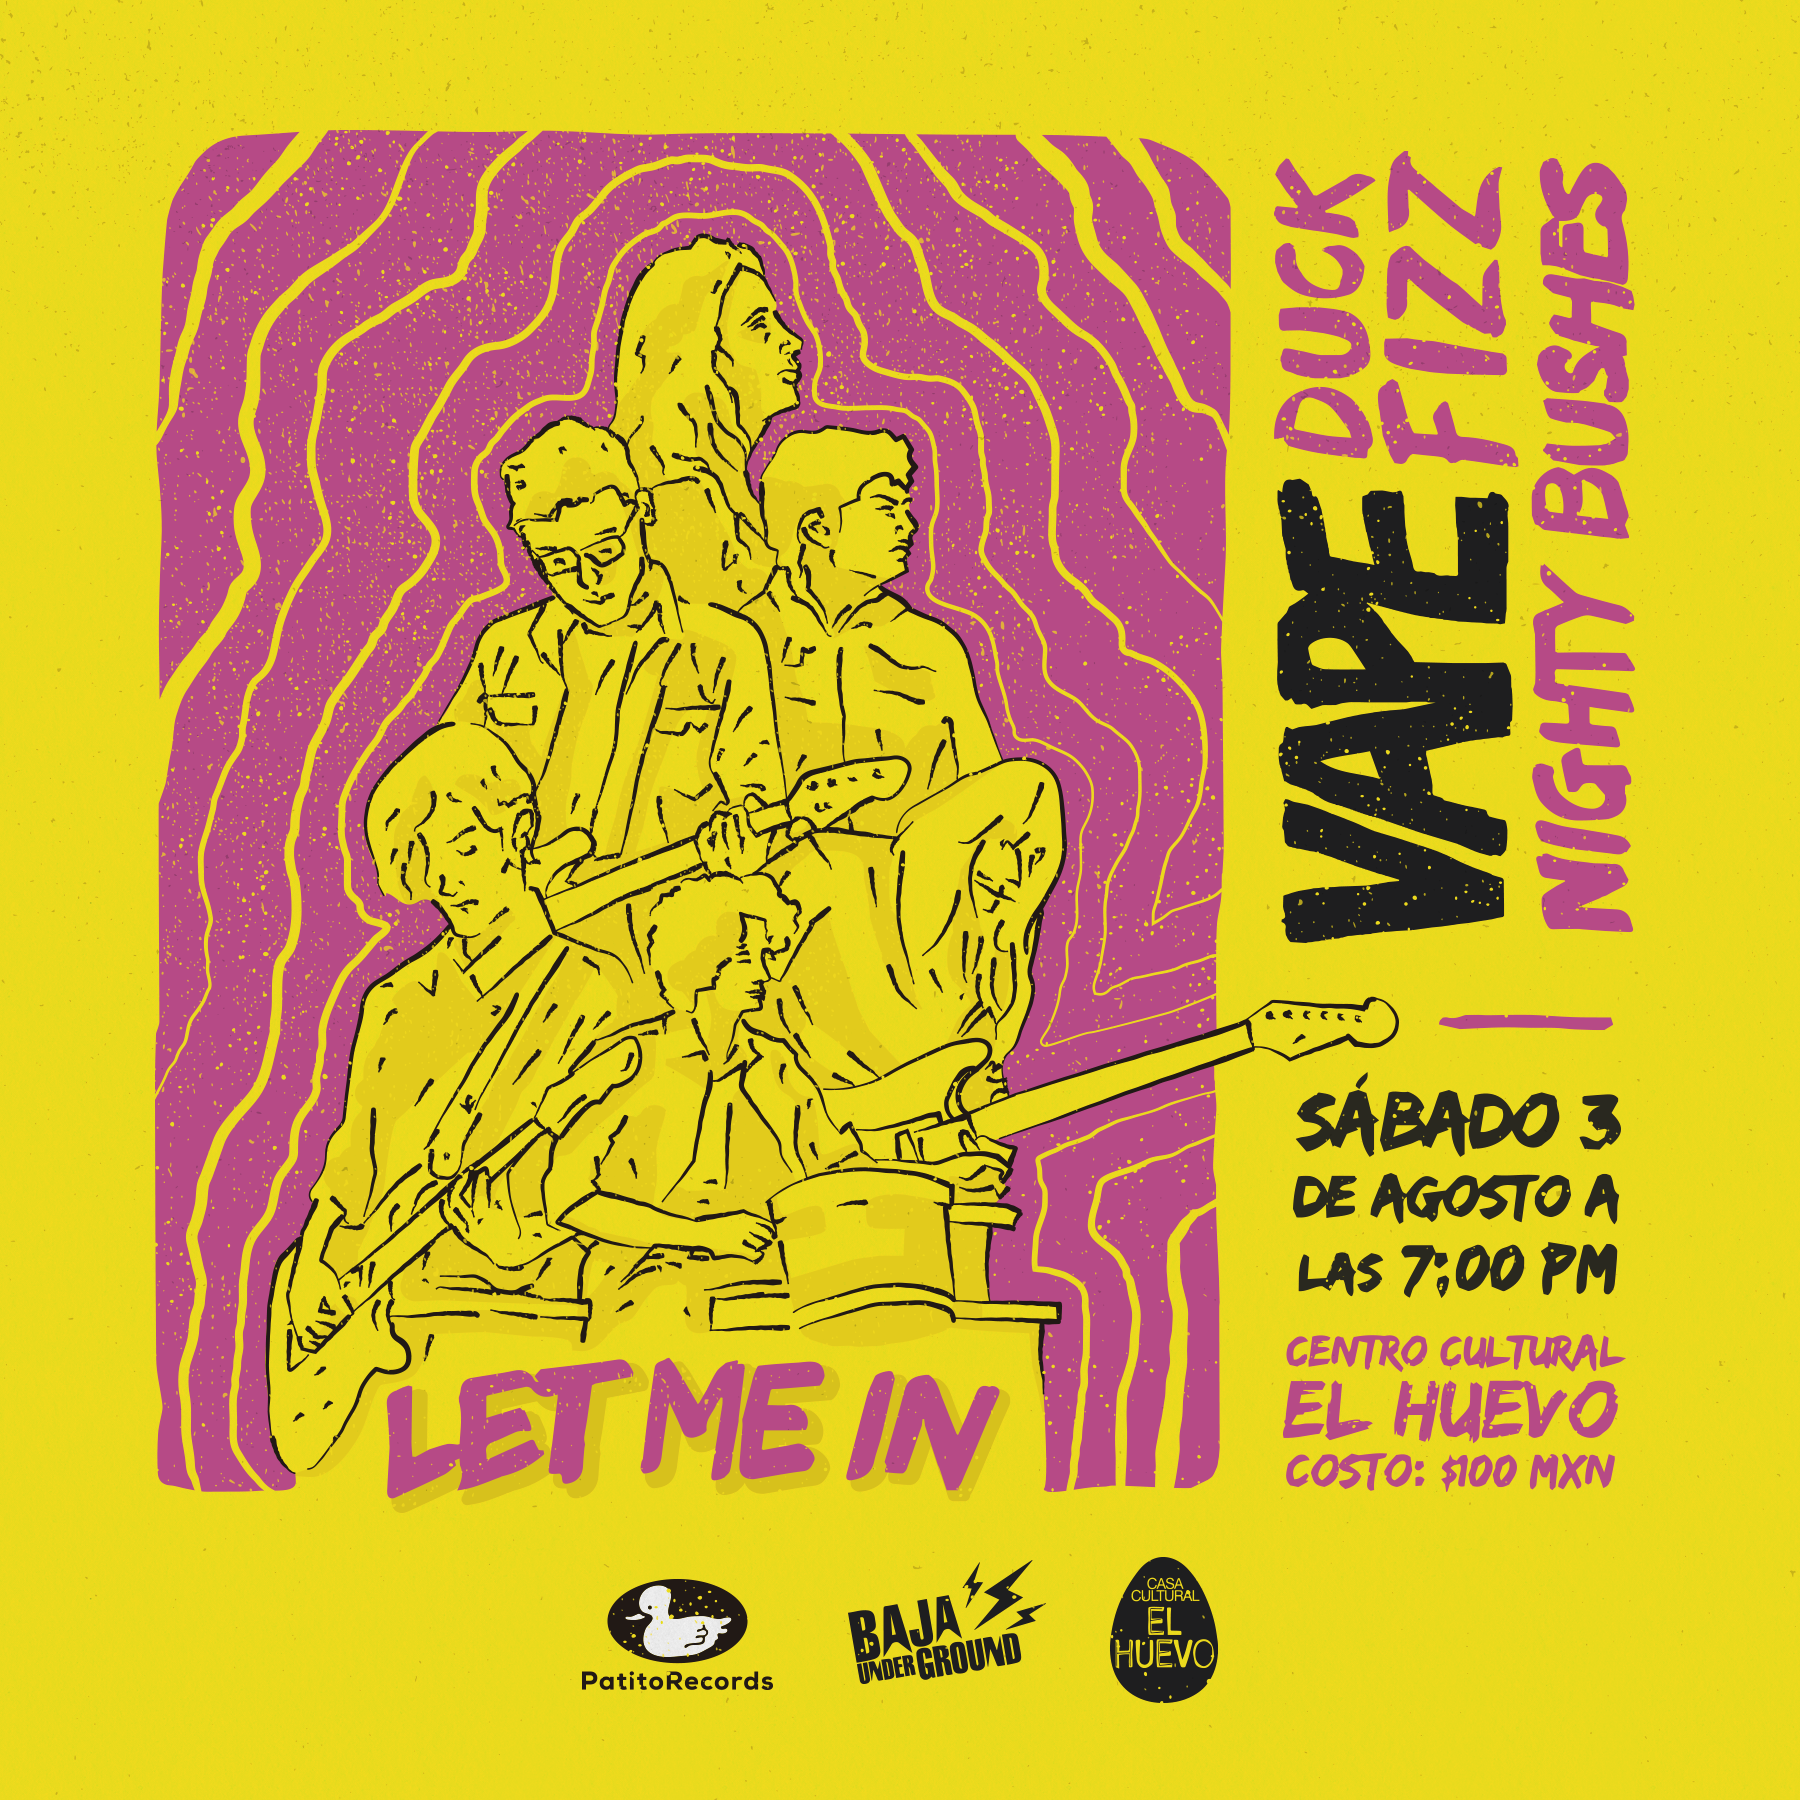 Fiesta de Lanzamiento Let me in by Vape